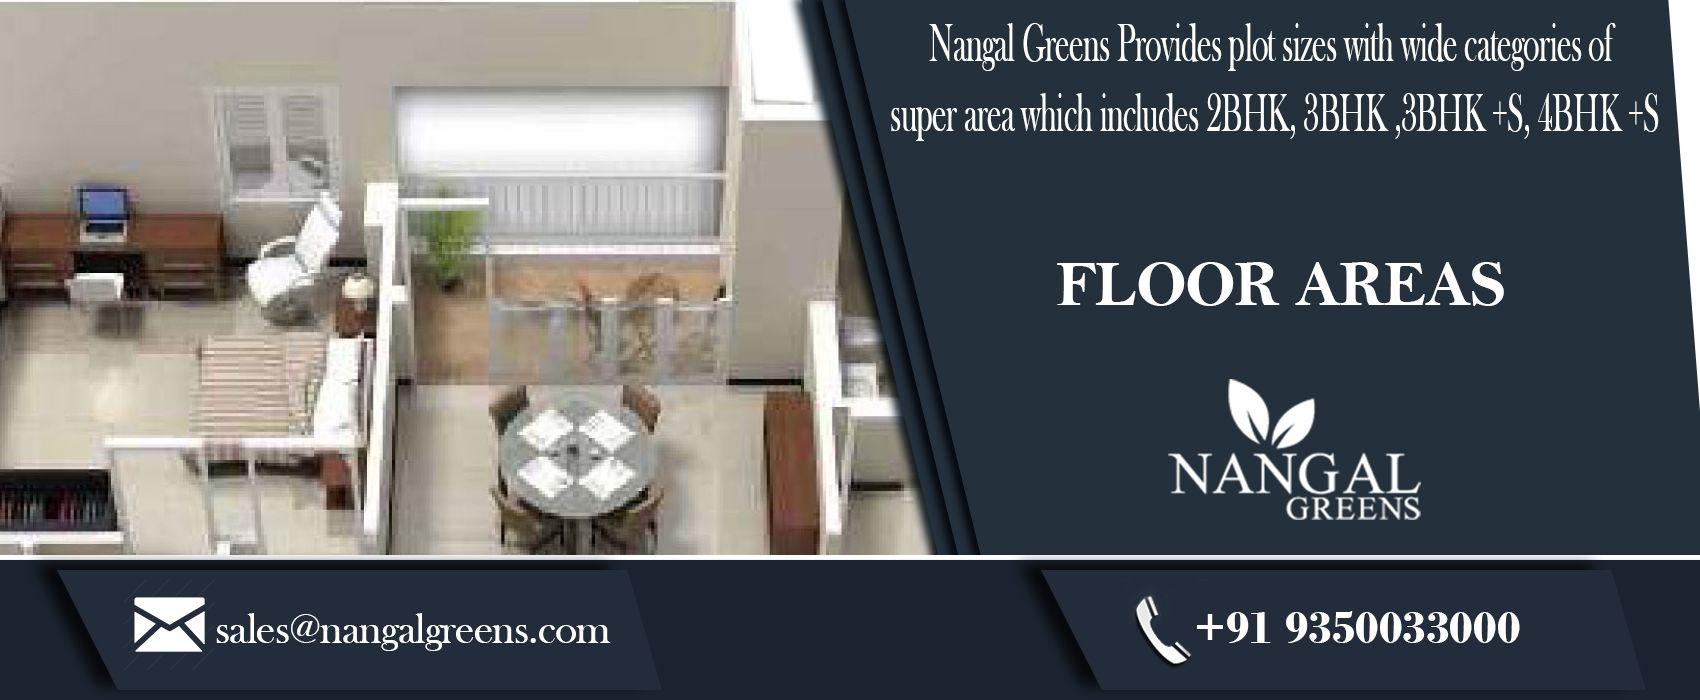 3 bhk wohndesign nangal greens nangalgreens on pinterest